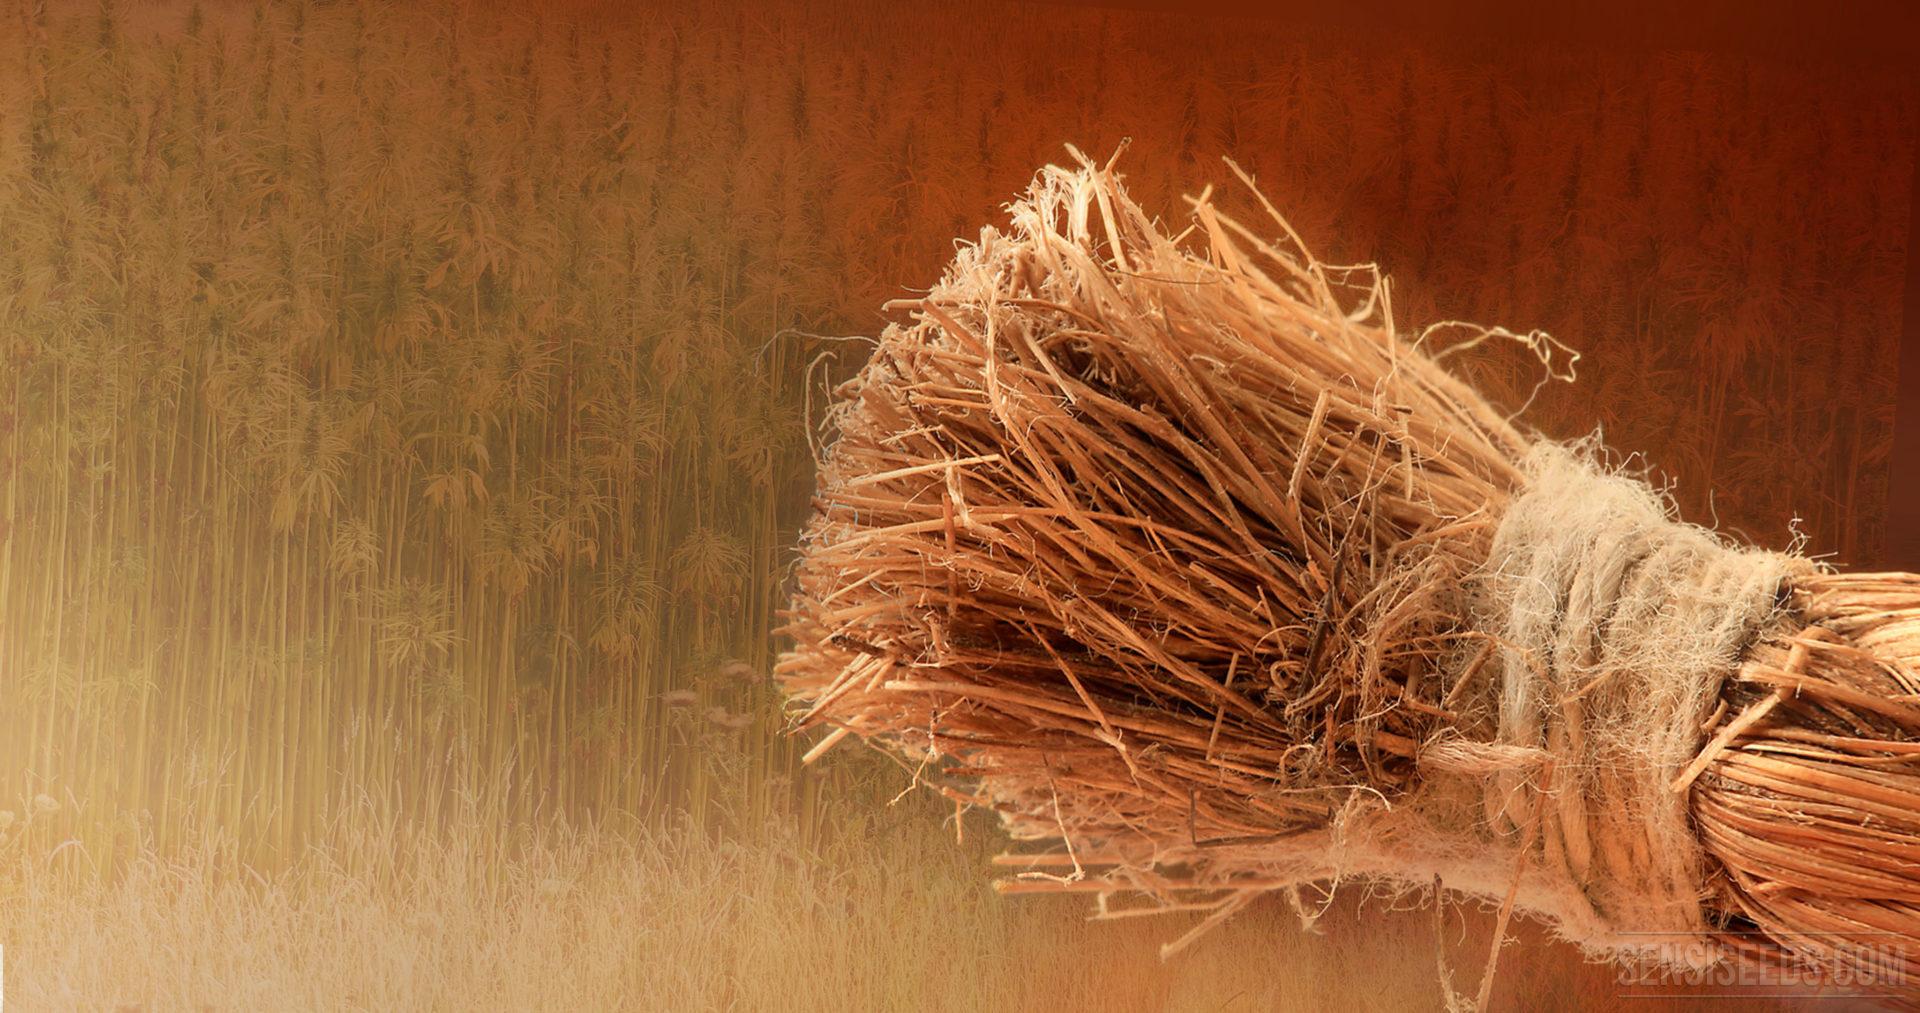 How are hemp plastics made?